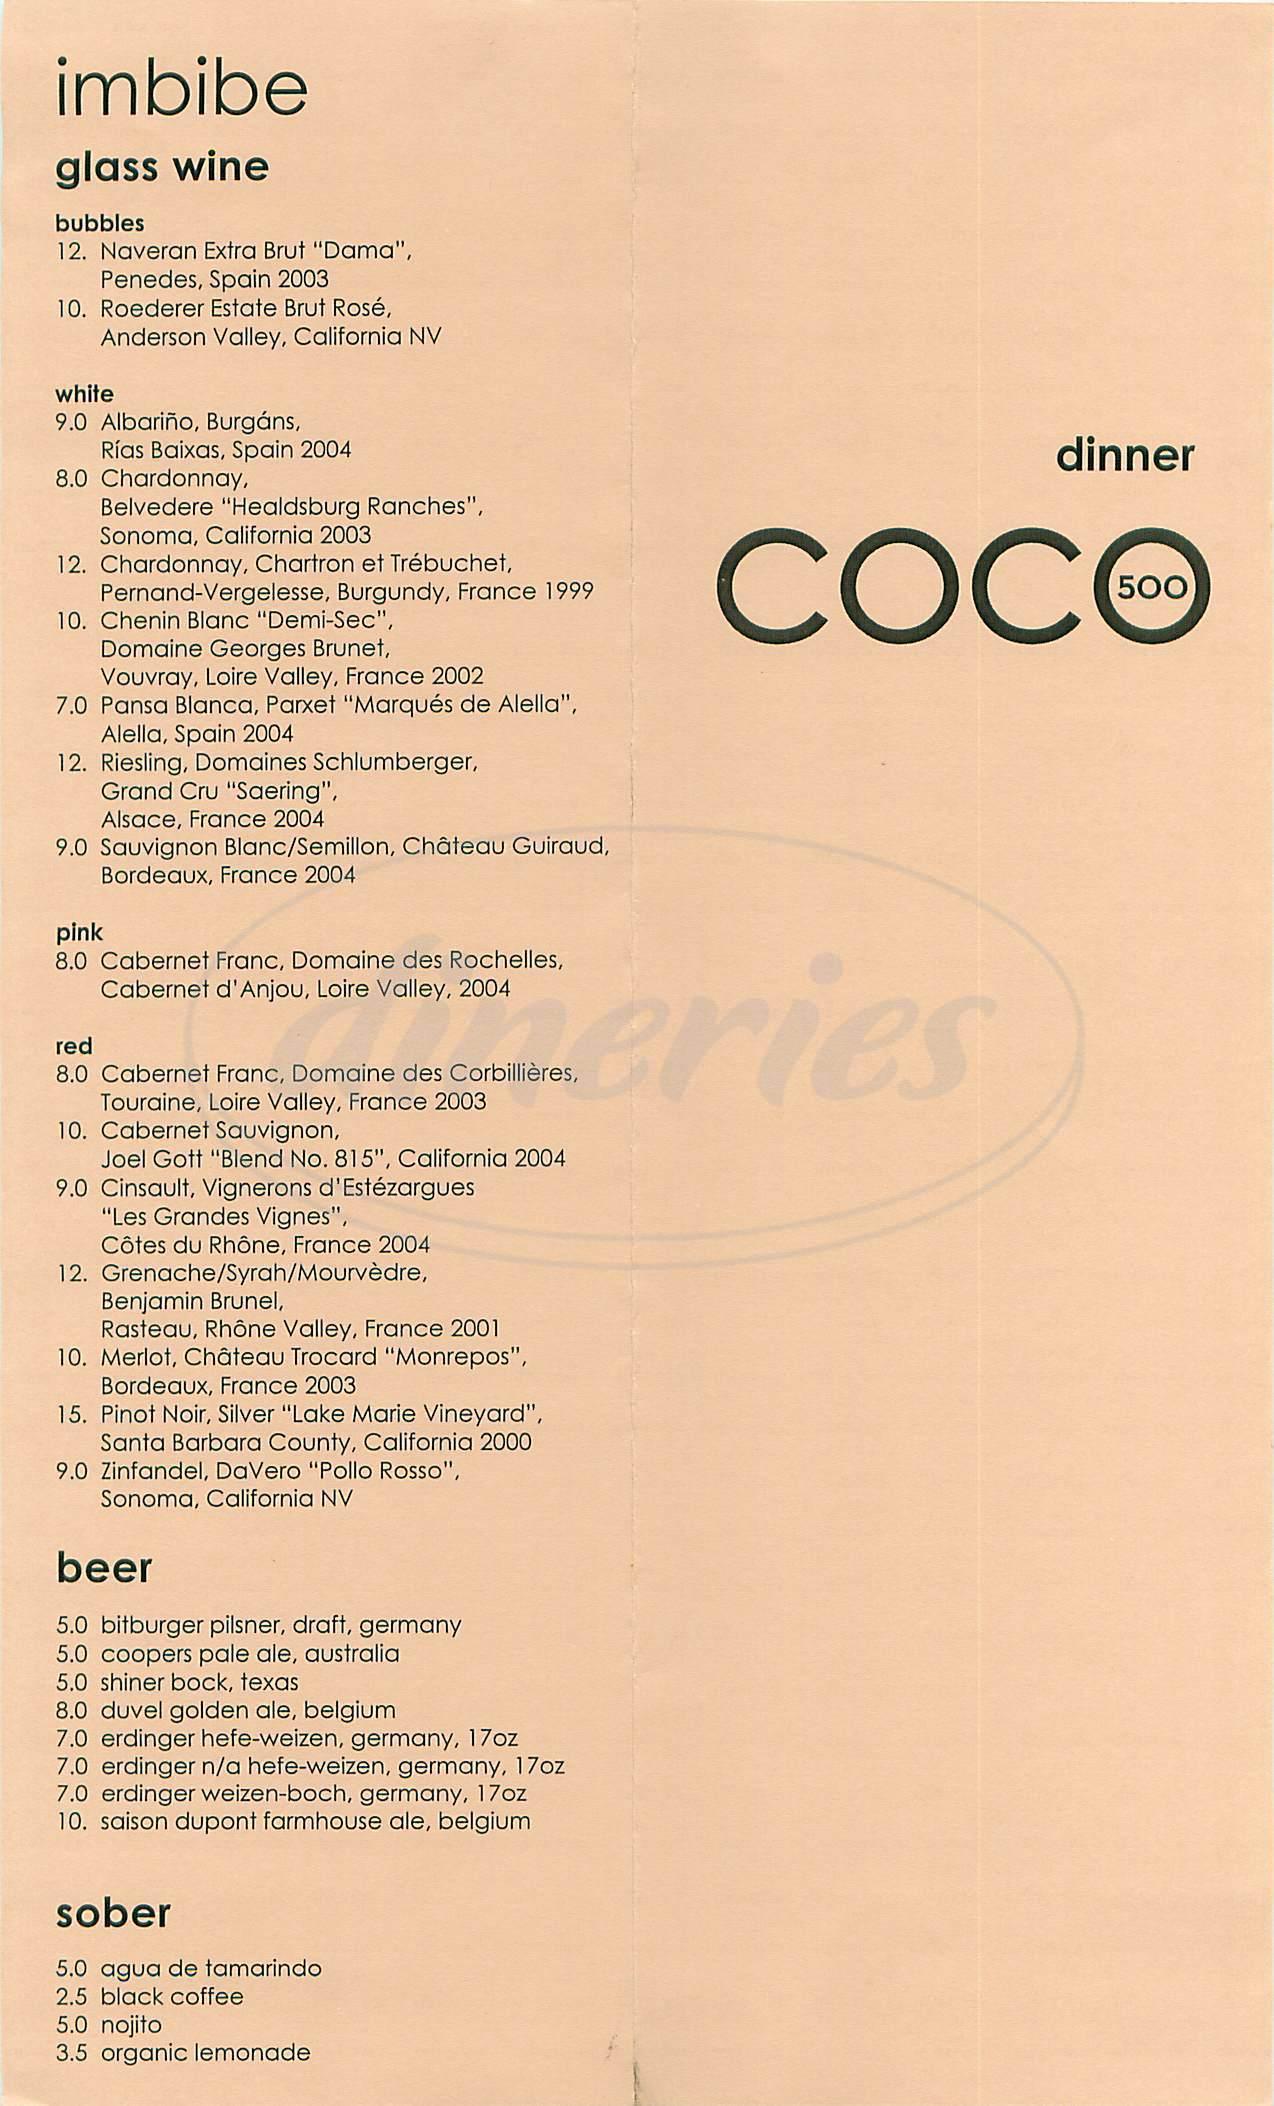 menu for Coco500